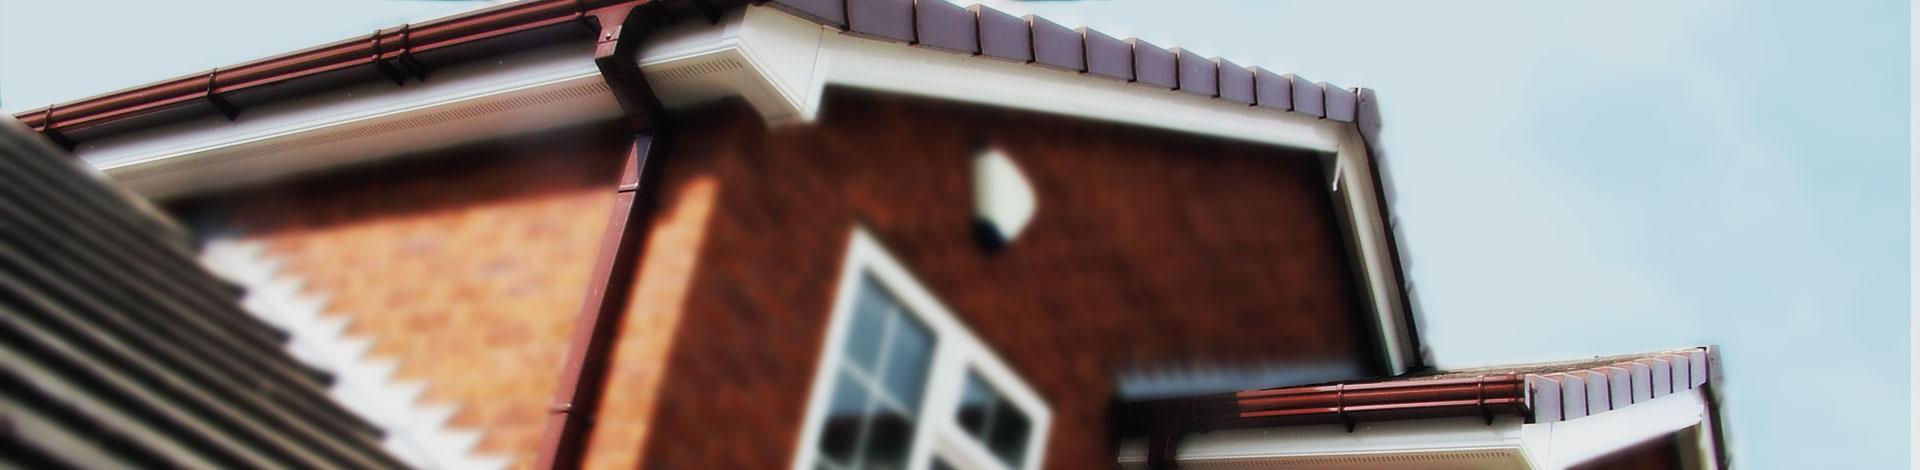 Roofline & Gutters